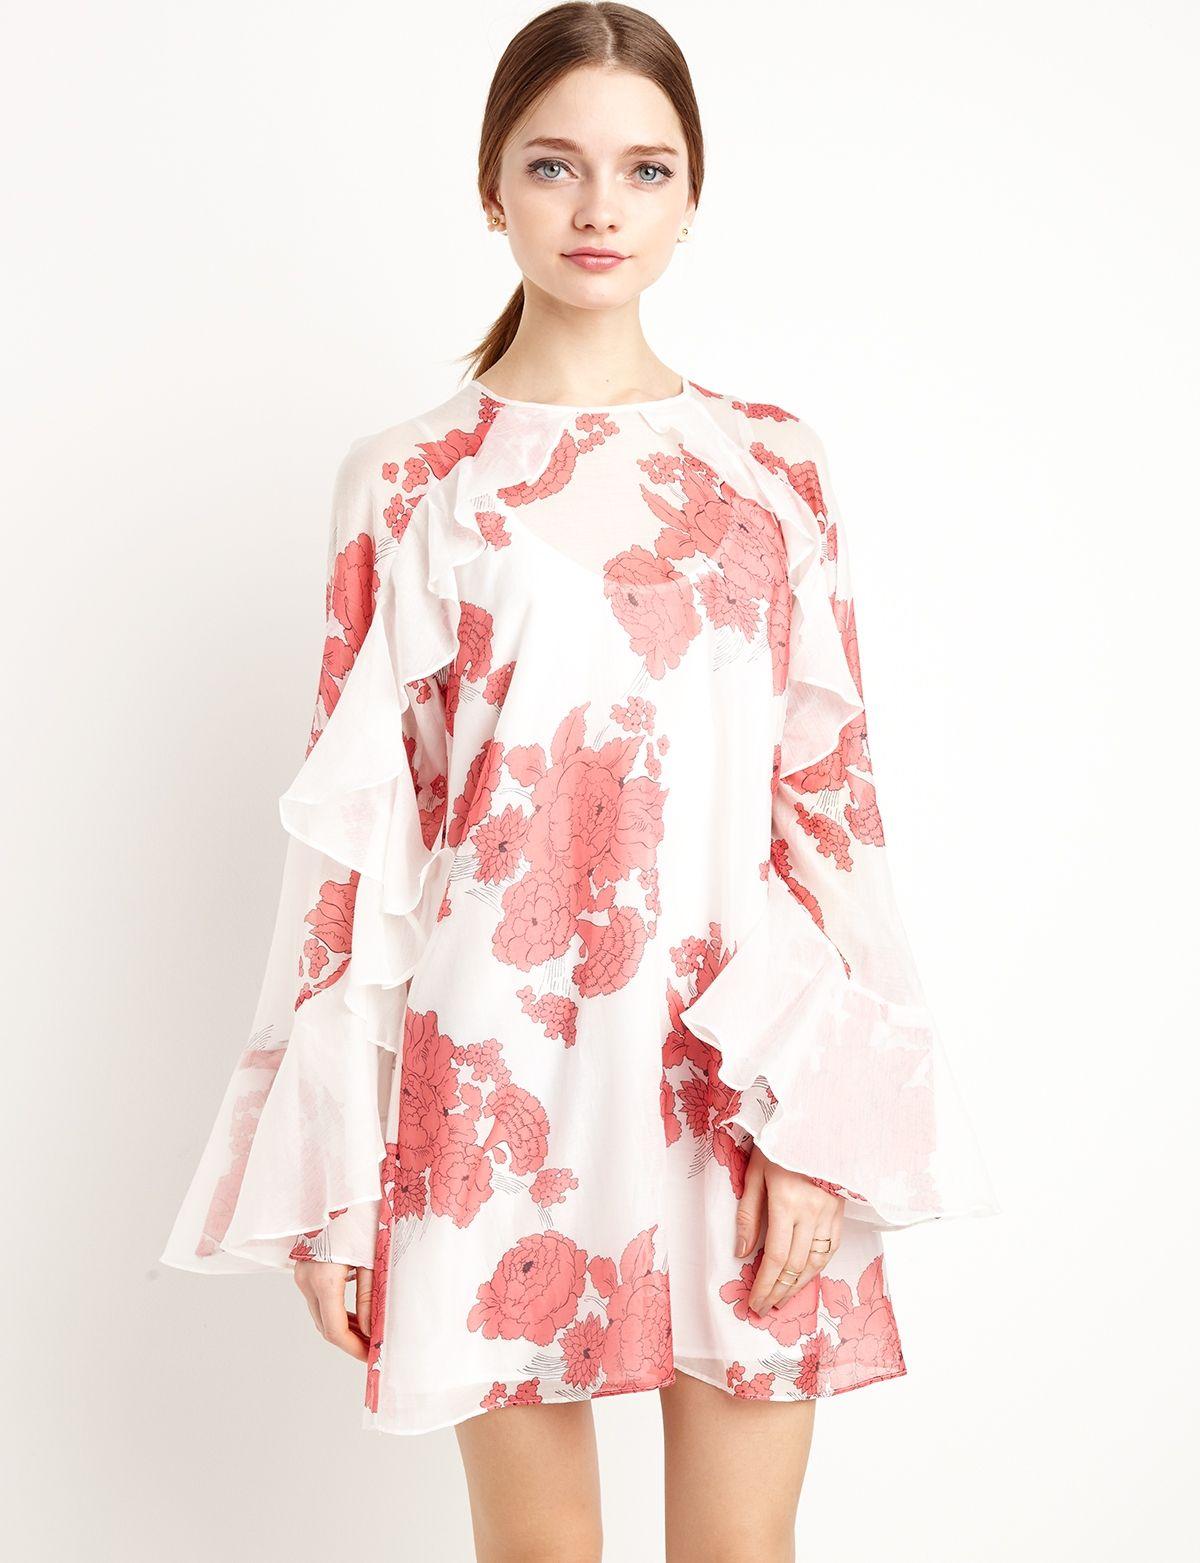 Pretty ruffled floral dress with flared ruffled sleeves. Semi sheer ...